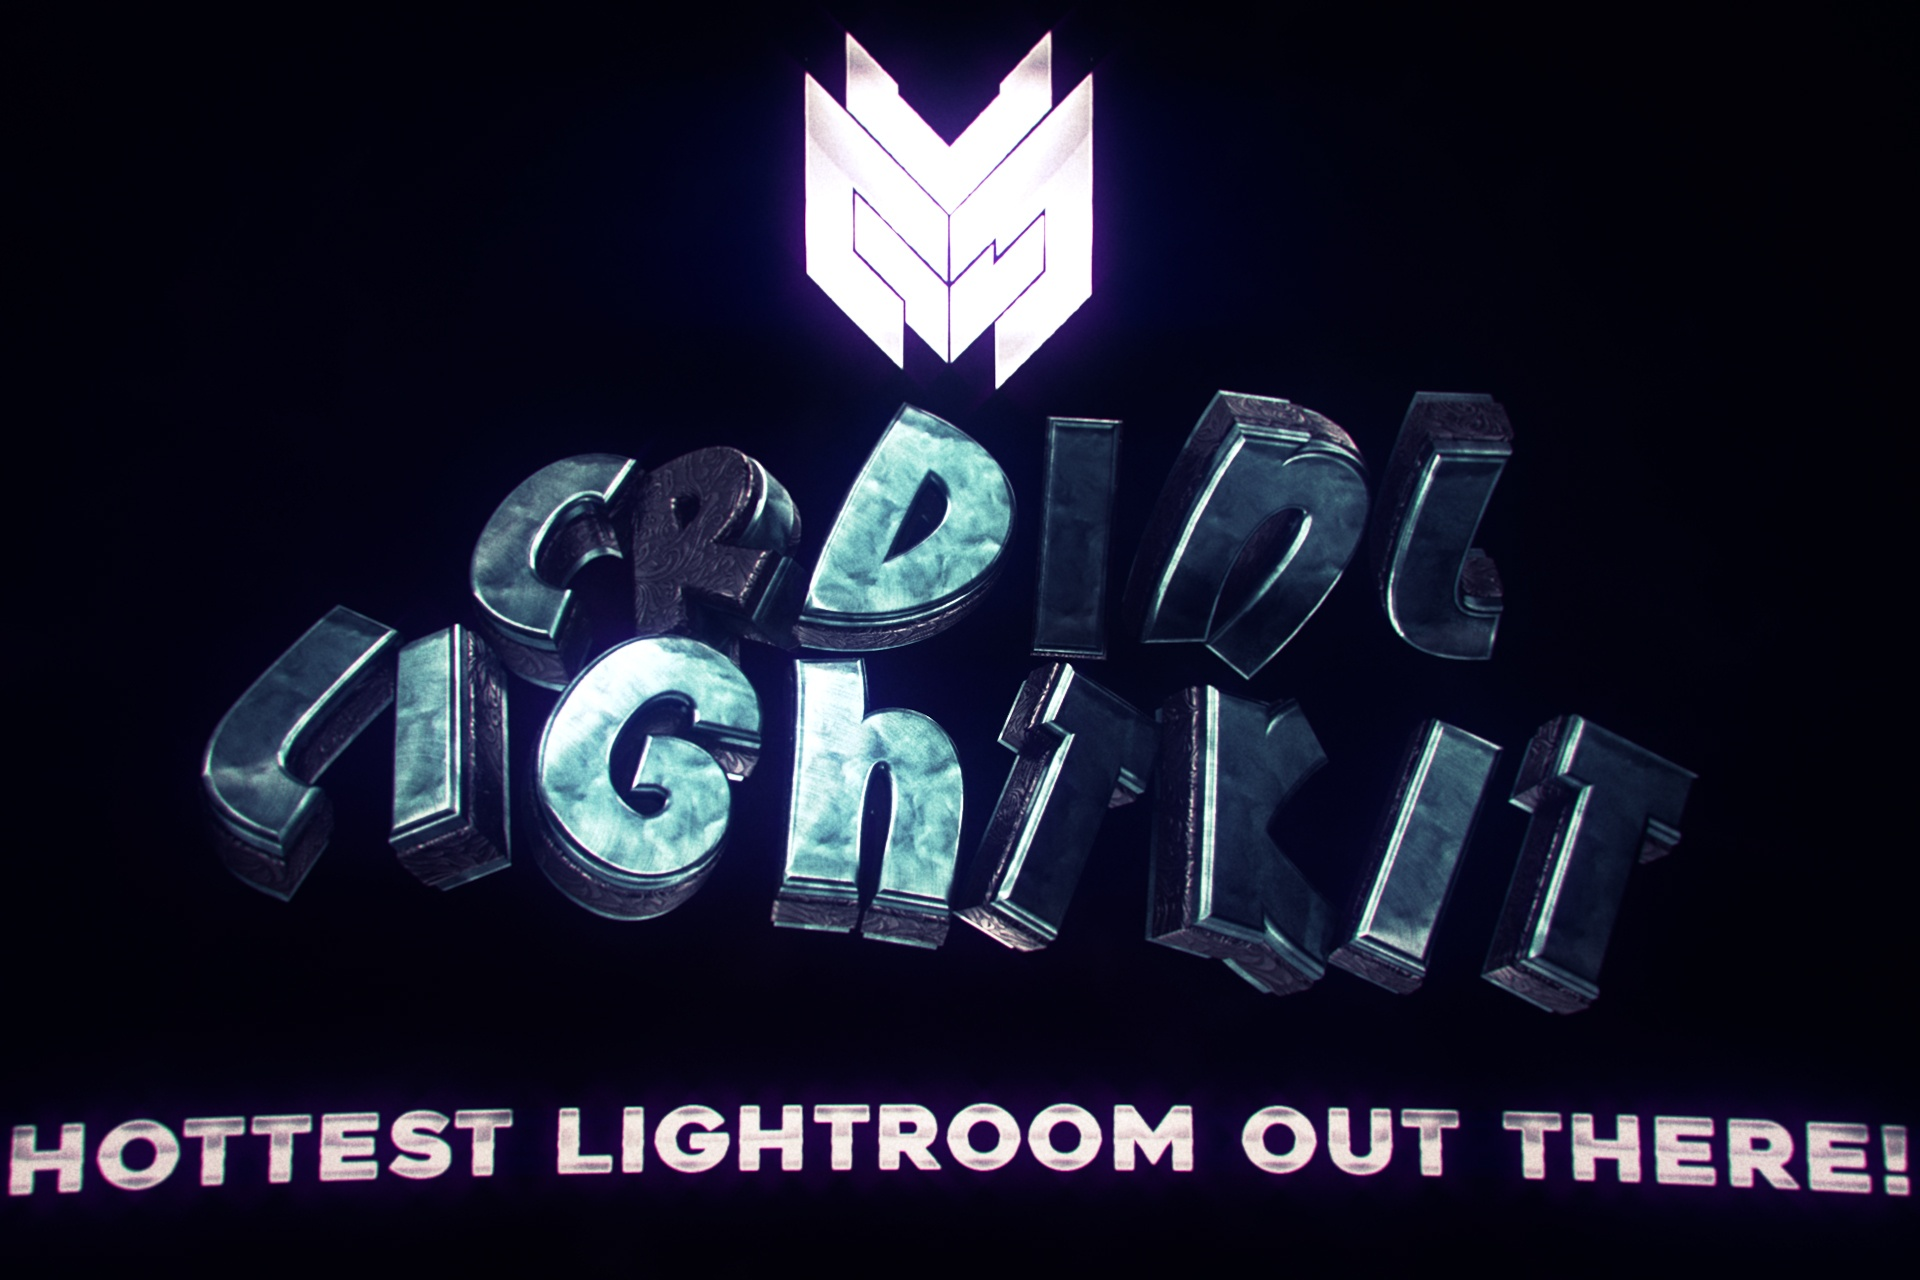 EQNX CARDINAL LIGHTKIT! (PRIVATE LIGHTROOM)